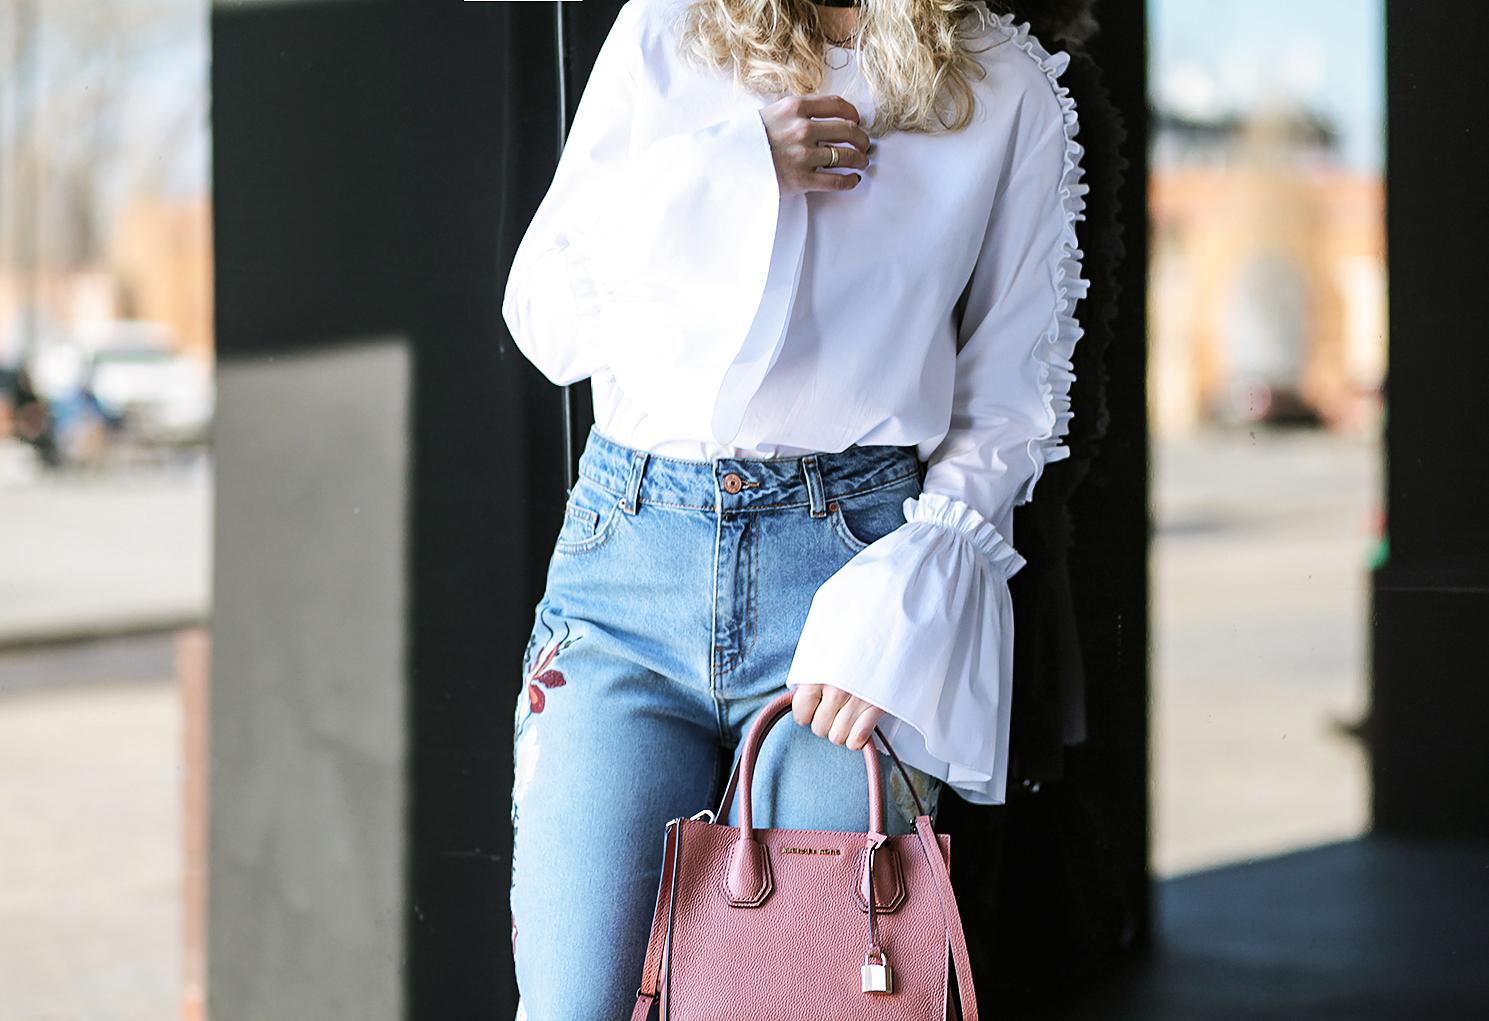 Rita_maslova_ritalifestyle_moscow_fashion_blogger_jeans_flowers_velvet_shoes8